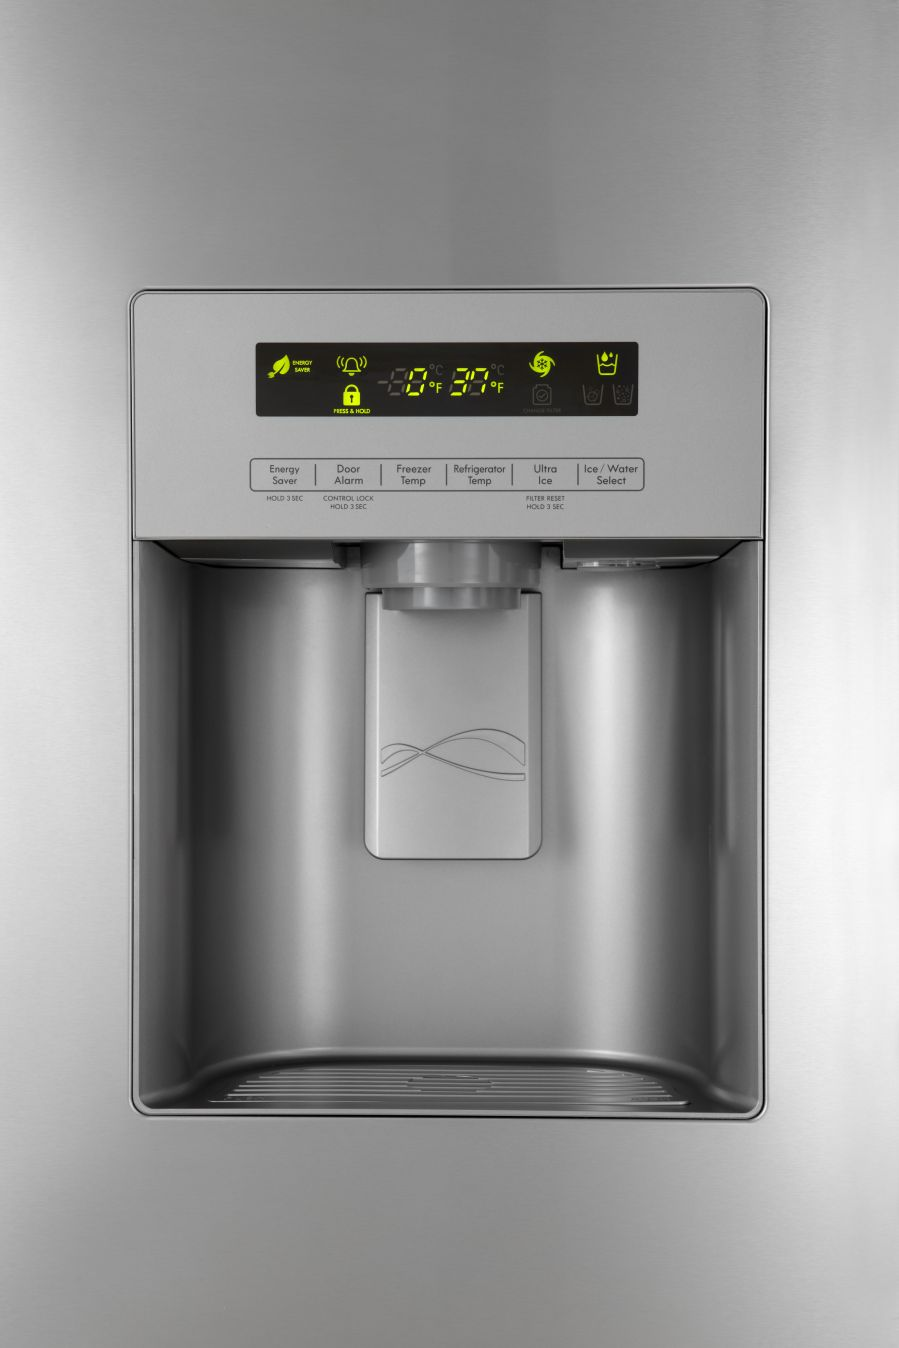 Kenmore 24.7 cu. ft. French-Door Bottom-Freezer Refrigerator - Stainless Steel